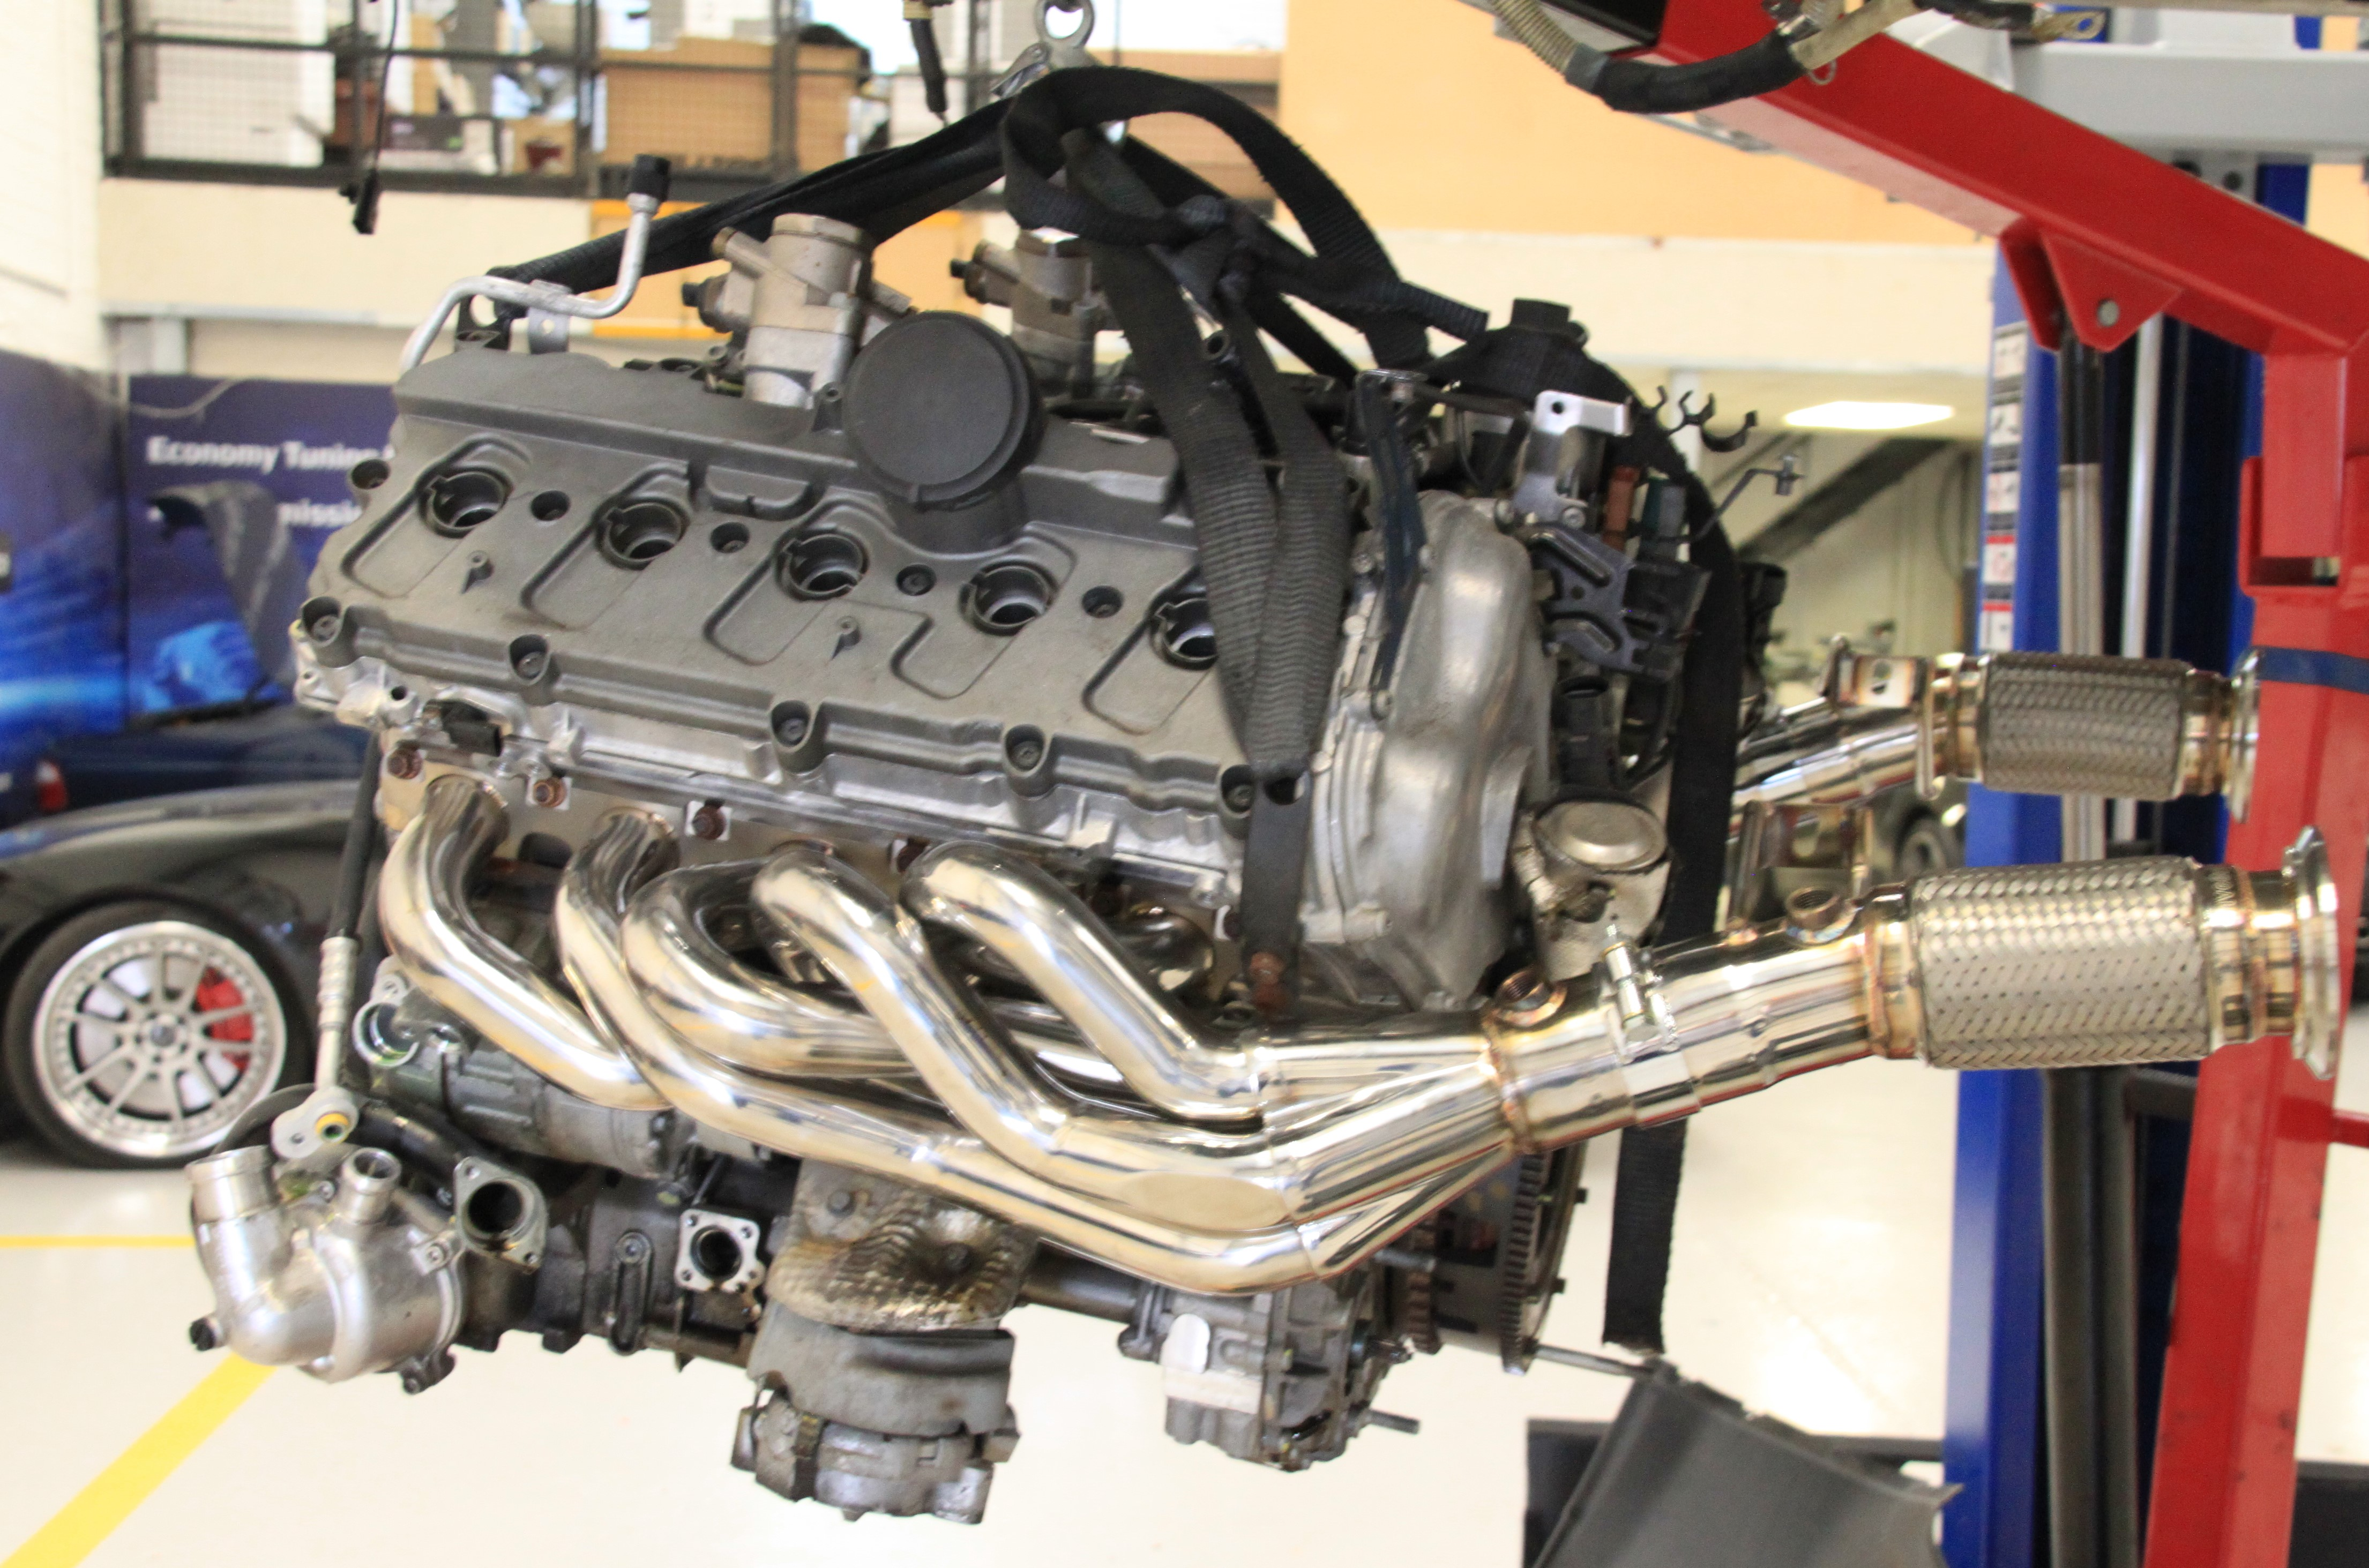 Lamborghini exhaust manifold